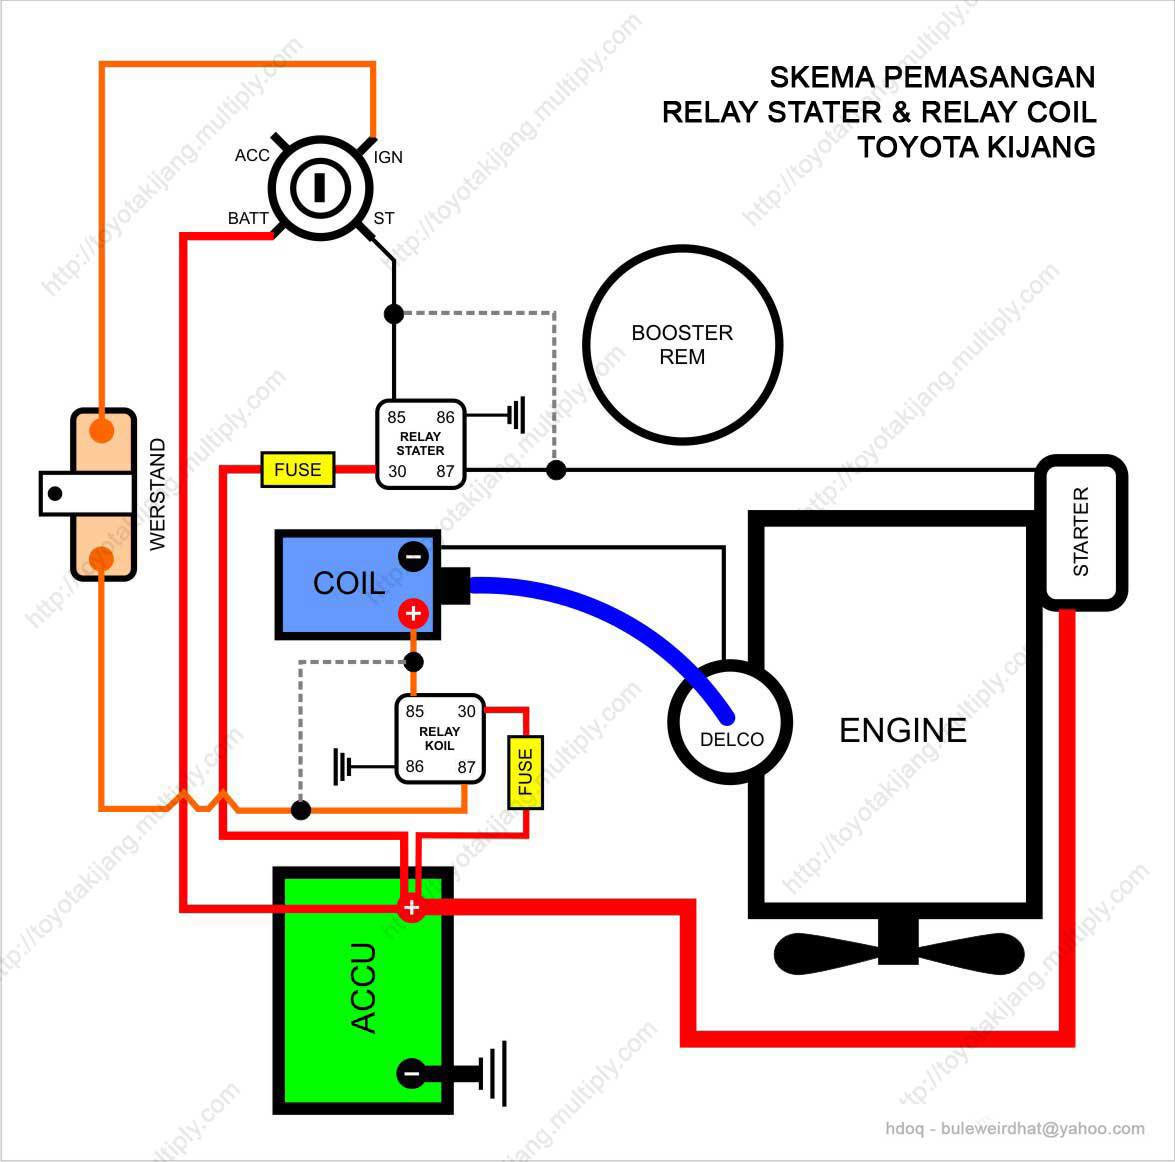 wiring diagram toyota kijang 7k efi wiring library rh 88 webseiten archiv de harga mobil bekas toyota kijang super toyota kijang 1996 [ 1175 x 1162 Pixel ]